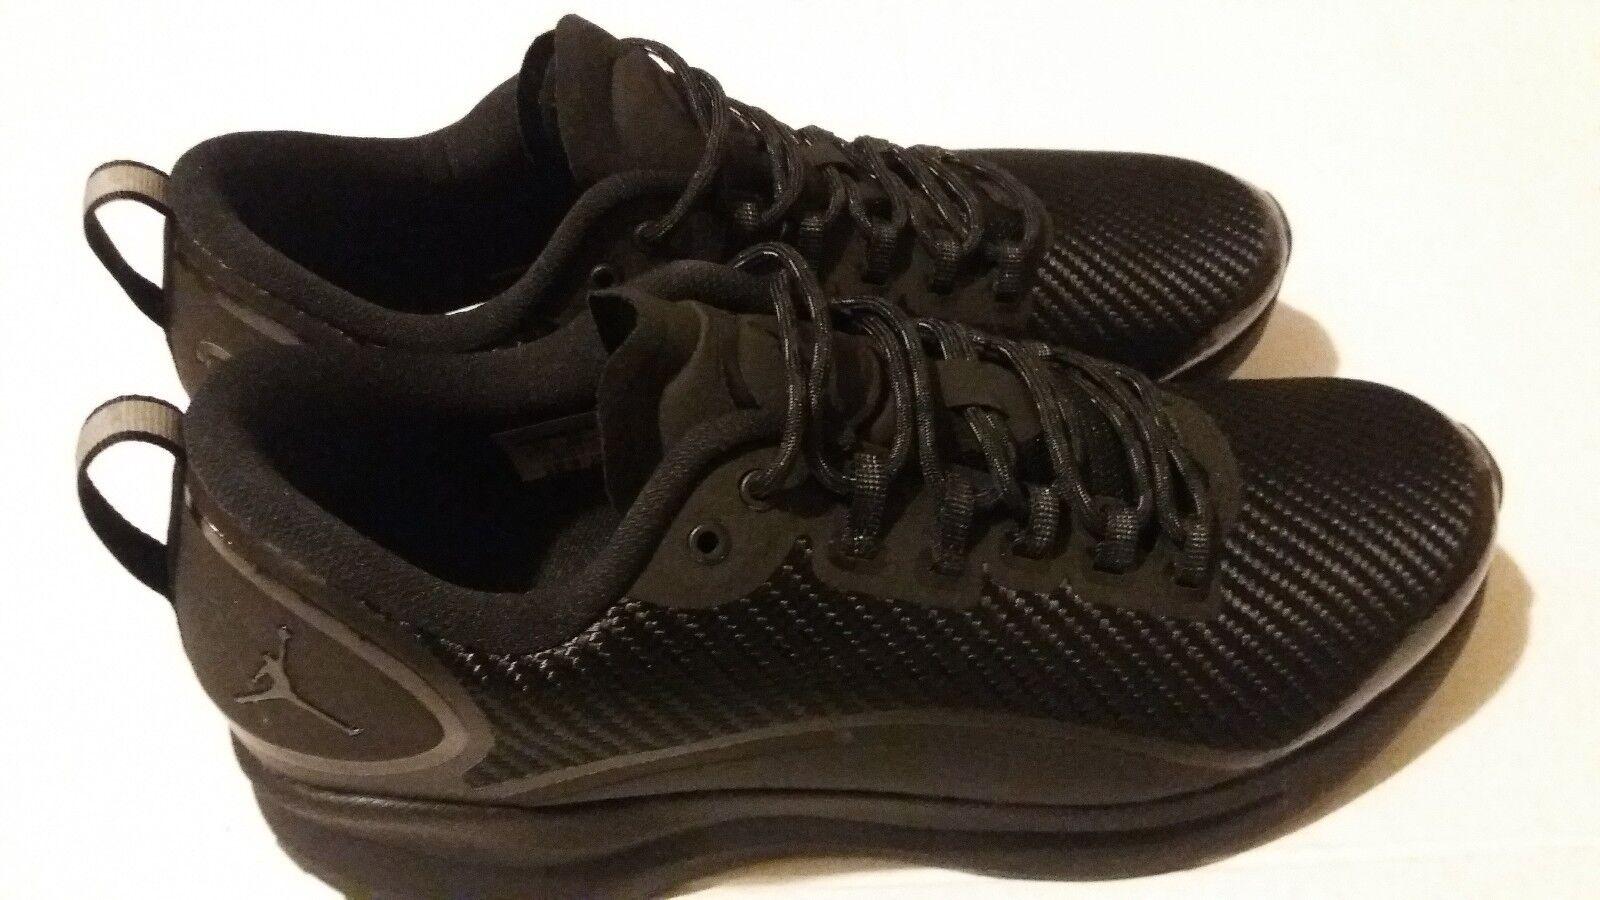 Nike Air Jordan Zoom Tenacity TRIPLE BLACK ALL AH8111-011 size 9.5Training shoes